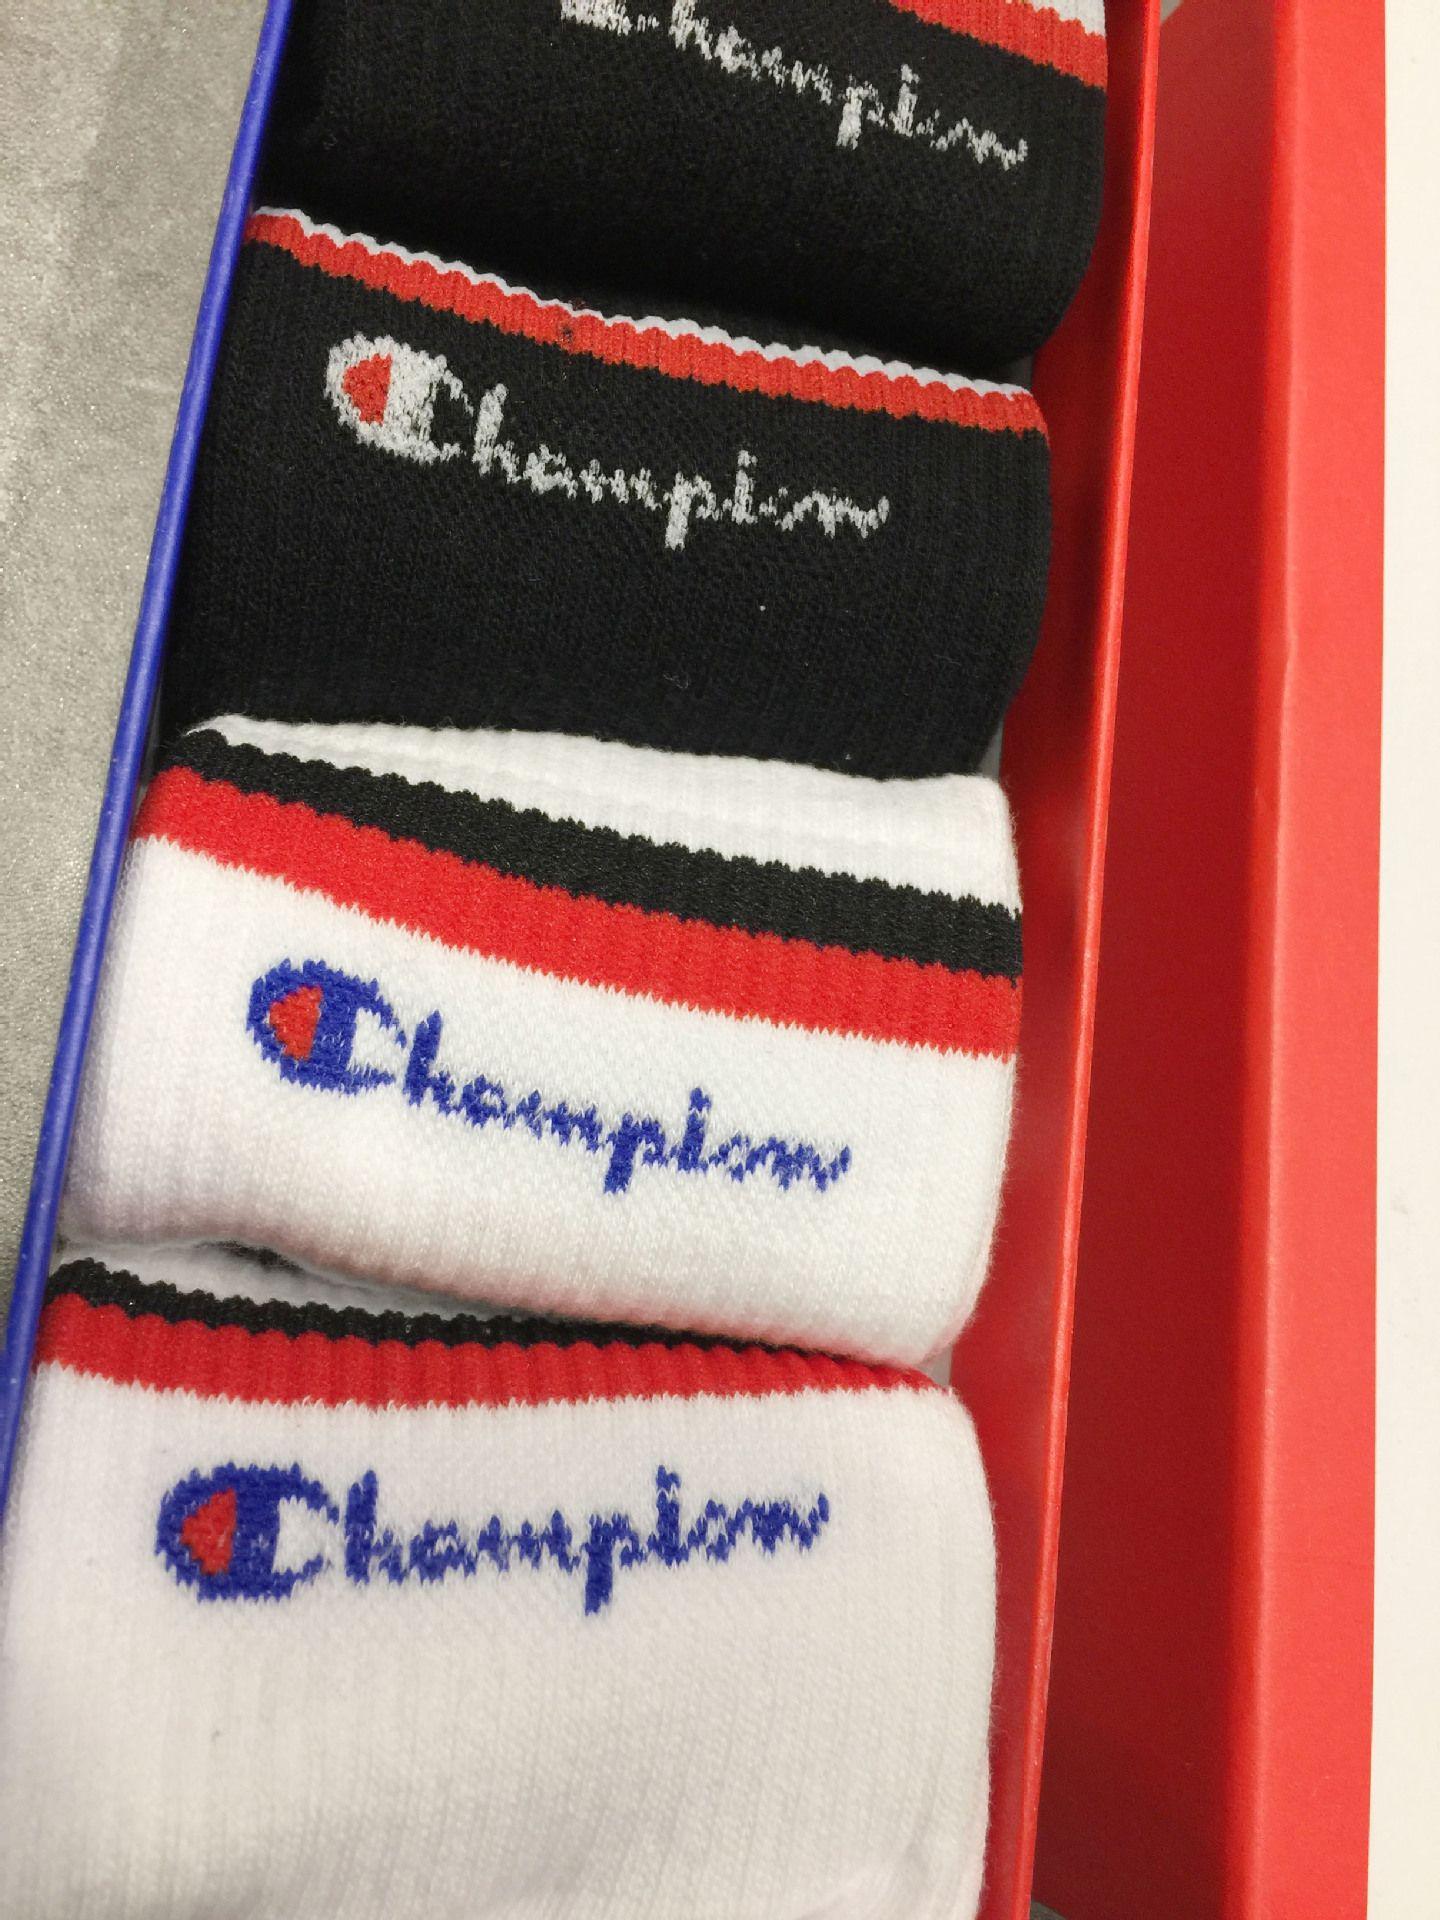 7c1359d6cc9 2019  Box Champions Brand Socks Stockings For Men And Women Fashion  Designer Antibacterial Cotton Luxury Brand Unisex Long Sport Socks From  Outdoor 888